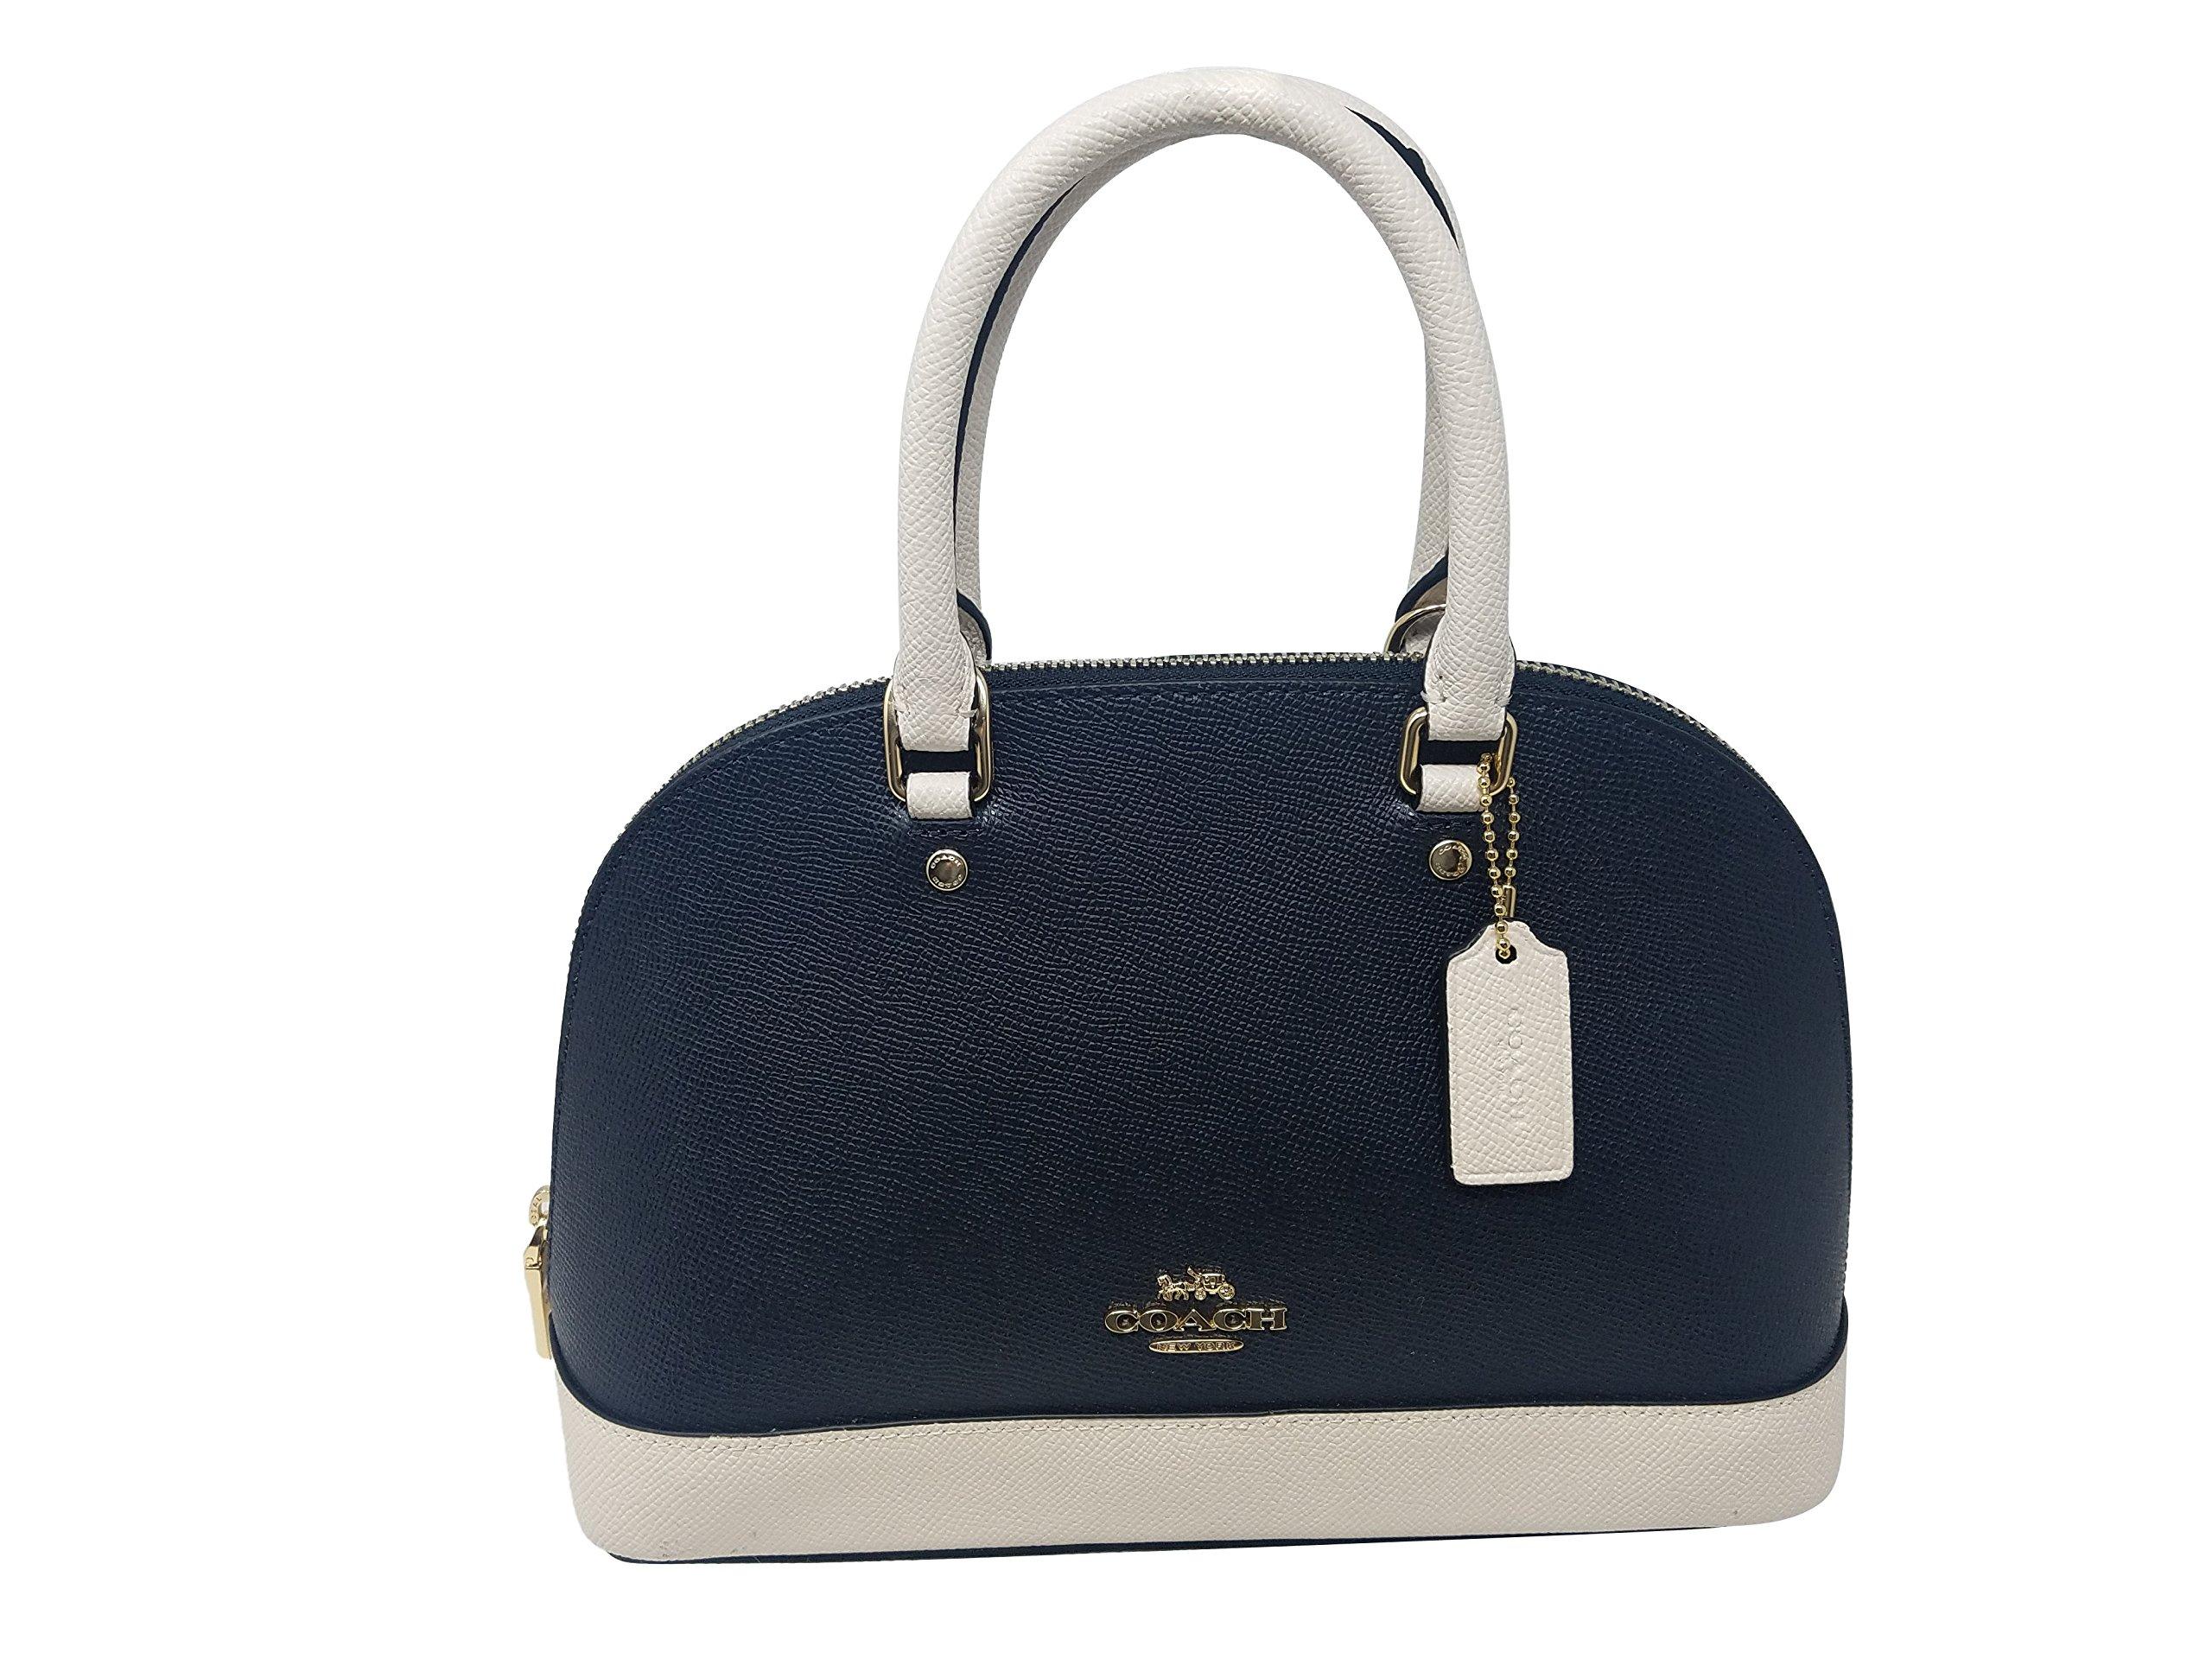 Galleon - Coach Womens Mini Sierra Satchel Handbag aabf931fd